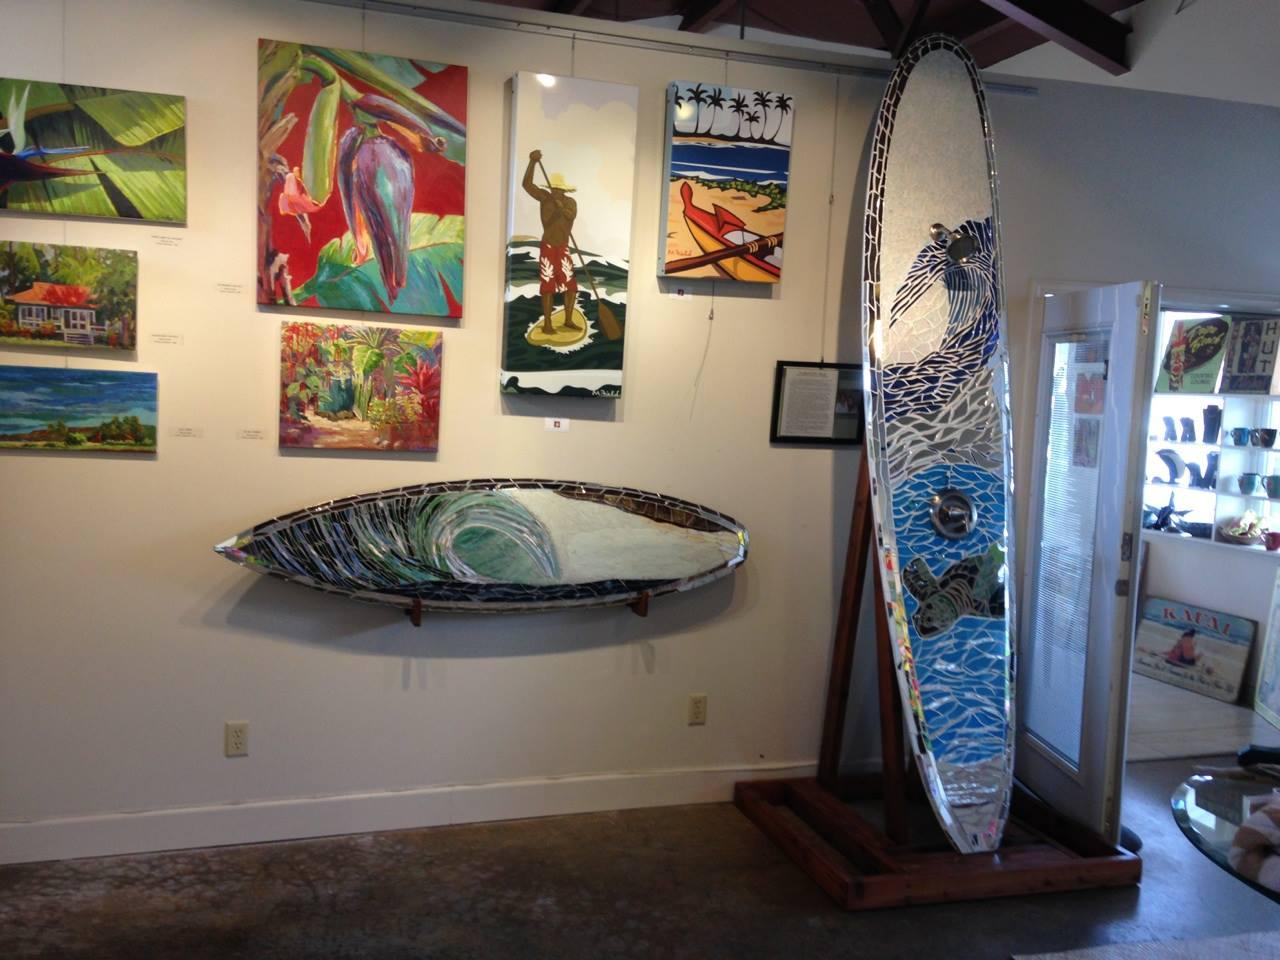 Mosaic Surfboard Shower and Wall Art